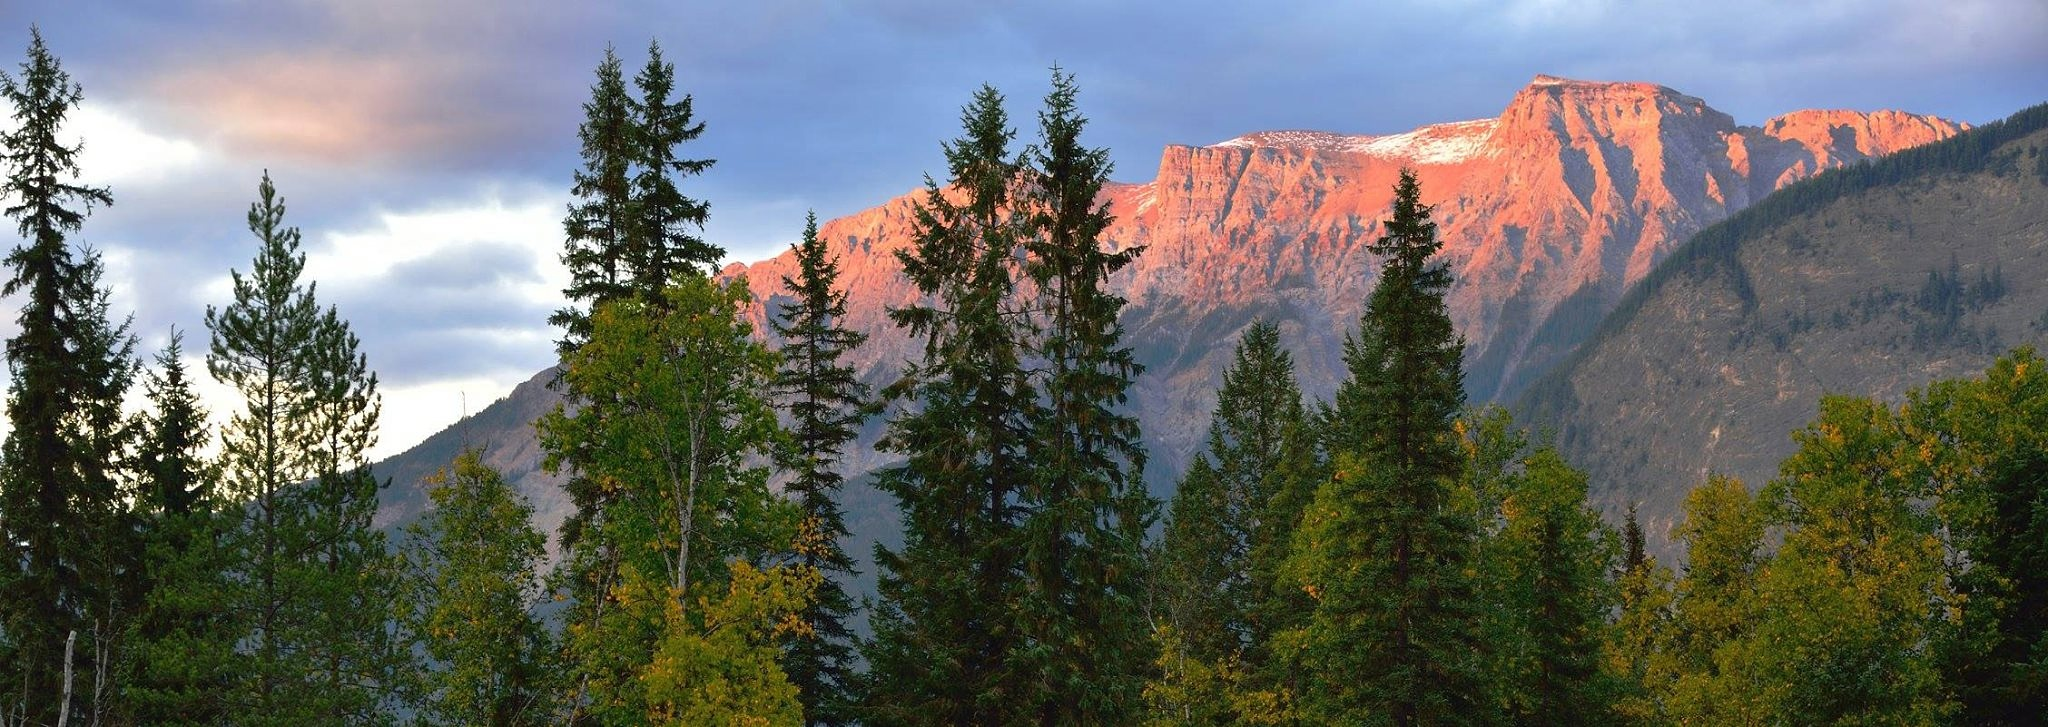 mountain top by michael.choppen